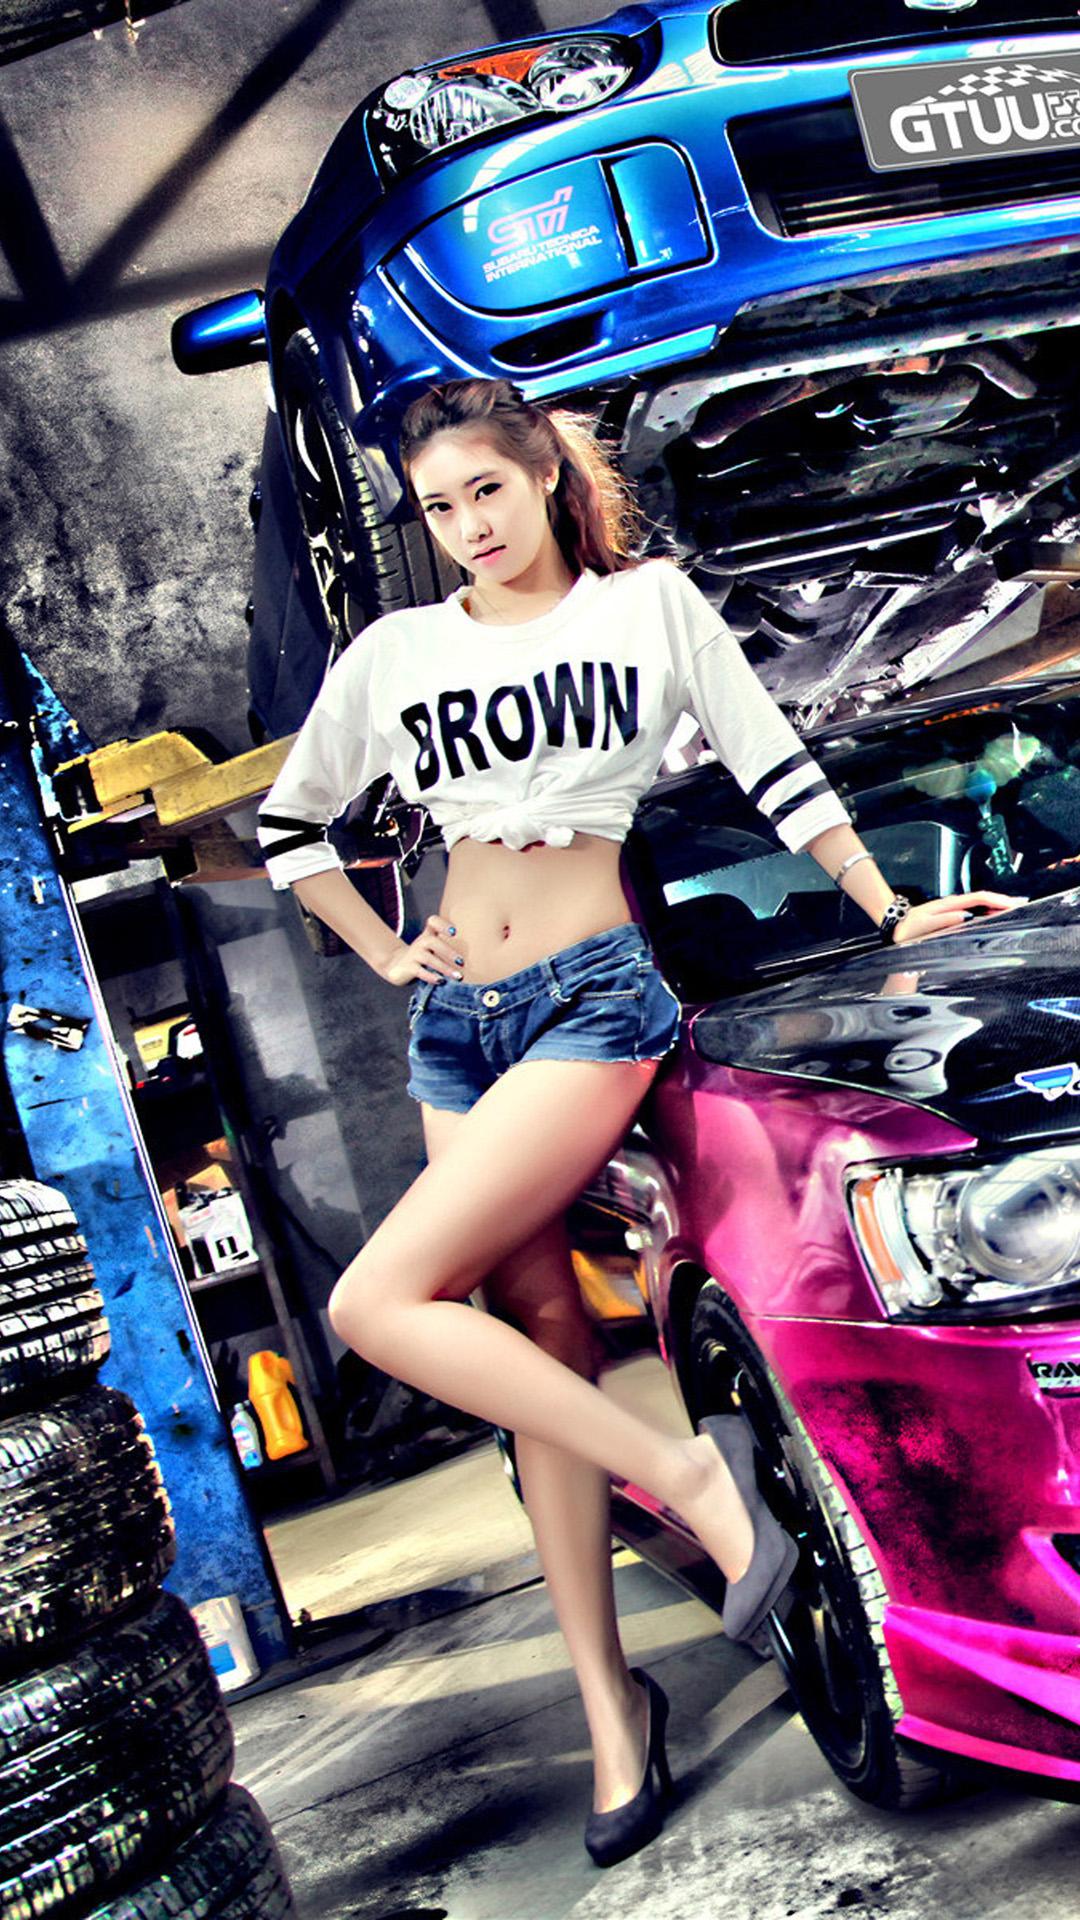 Car Girl Wallpaper For Iphone 1077404 Hd Wallpaper